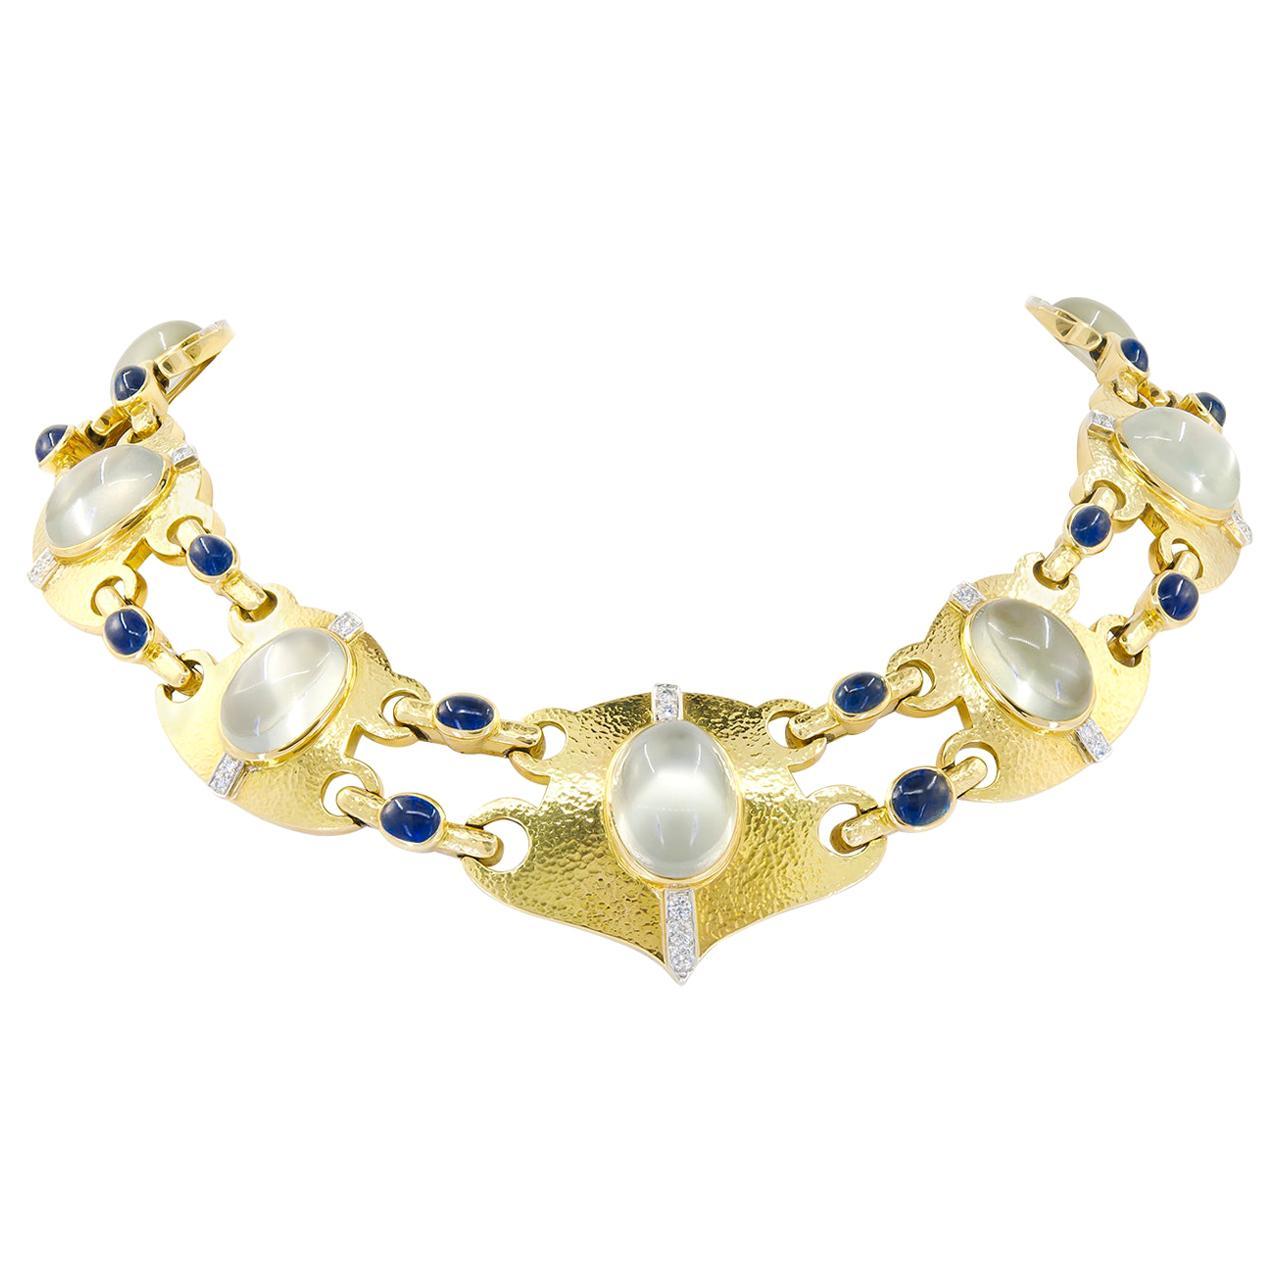 David Webb Cabochon Moonstone, Sapphire Diamond Necklace